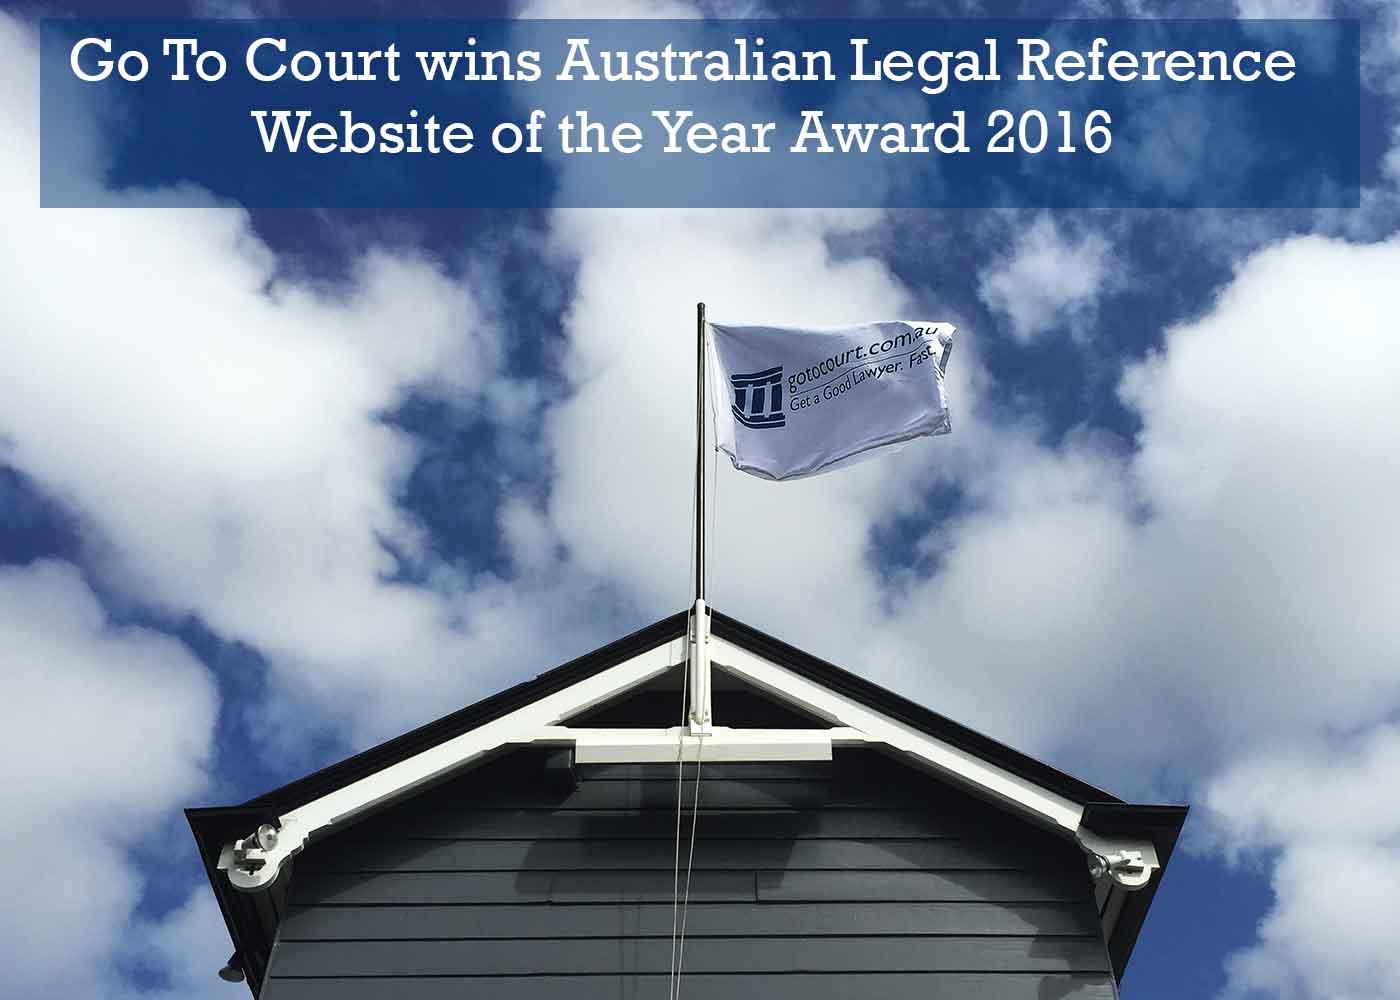 Go To Court Lawyers has won the 2016 GLE Australian Legal Website Award